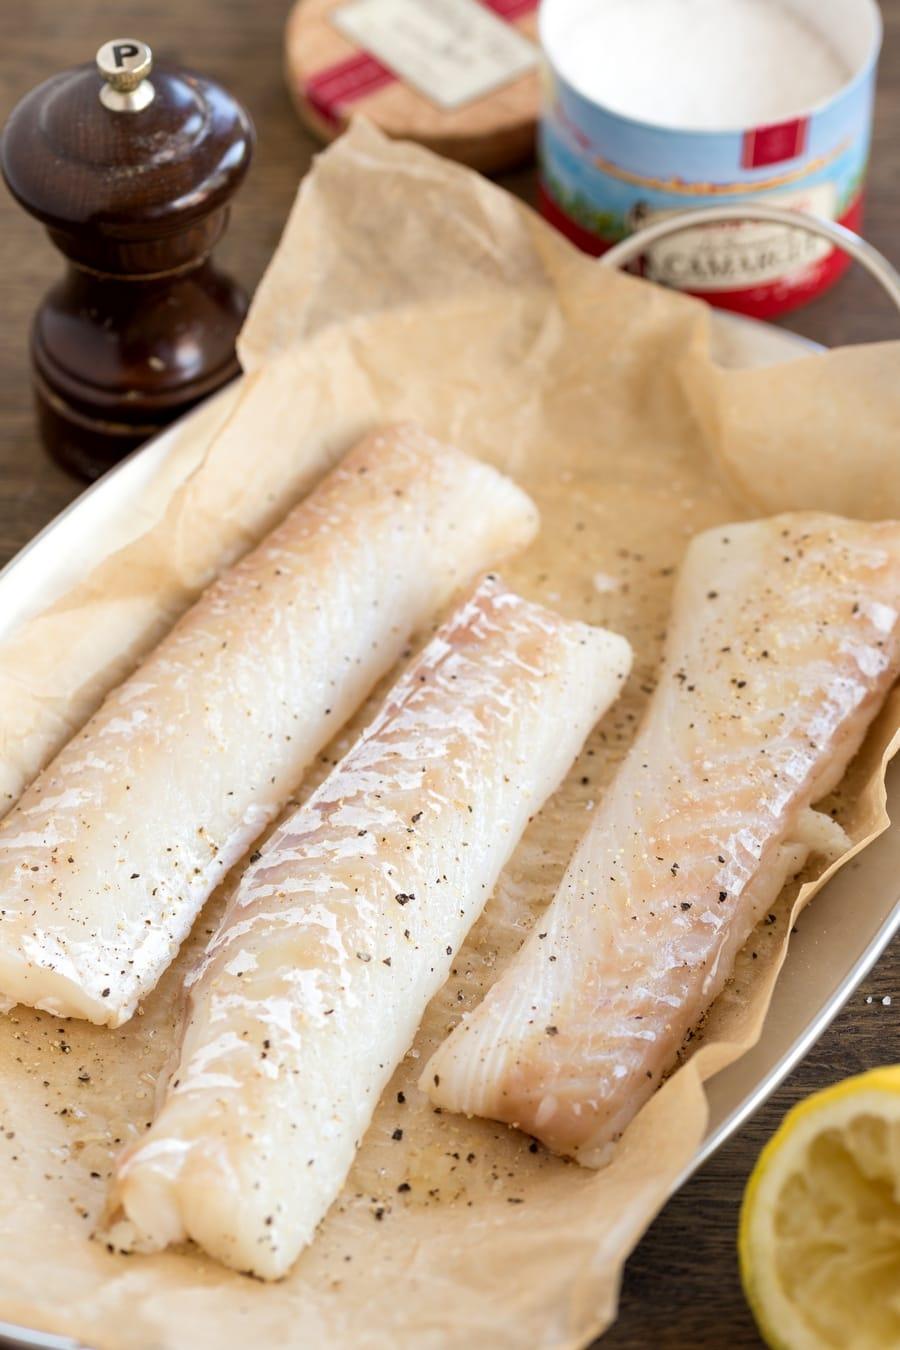 Cod fillets seasoned with back pepper and lemon juice.